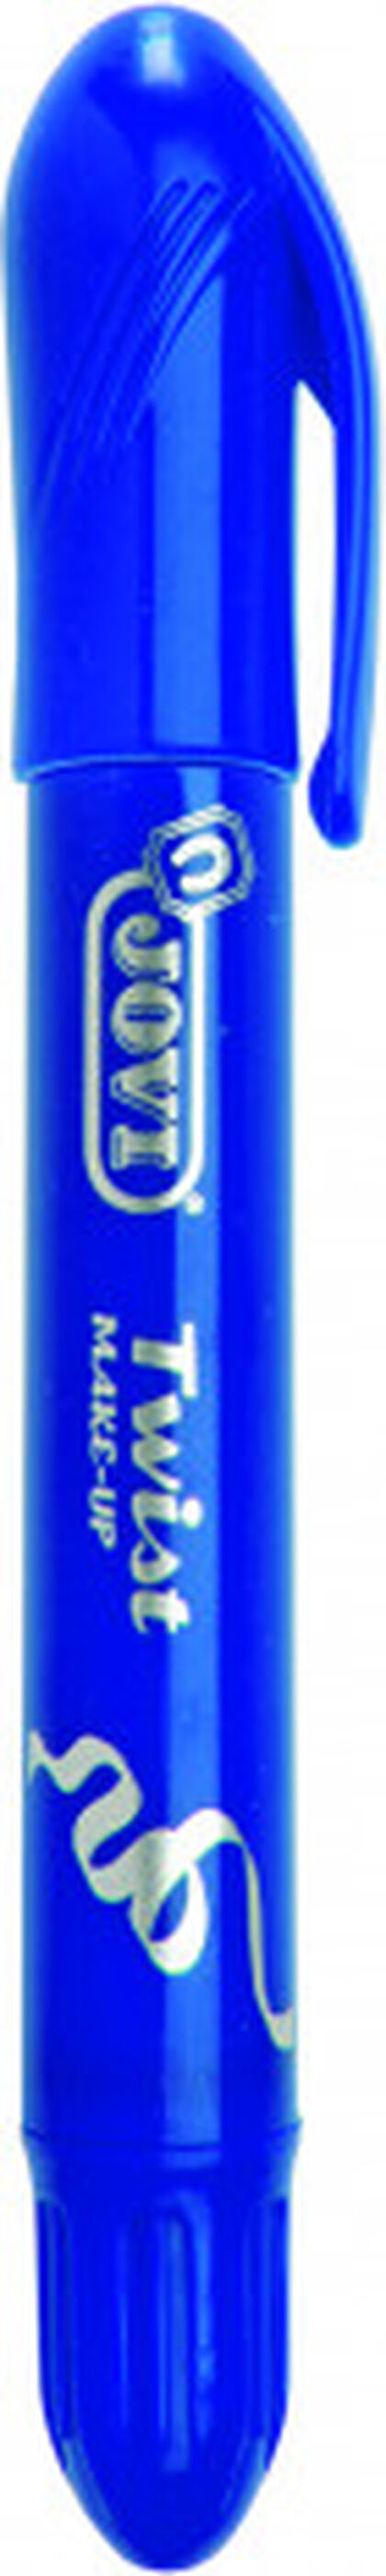 Maquillaje Jovi Twist Azul oscuro